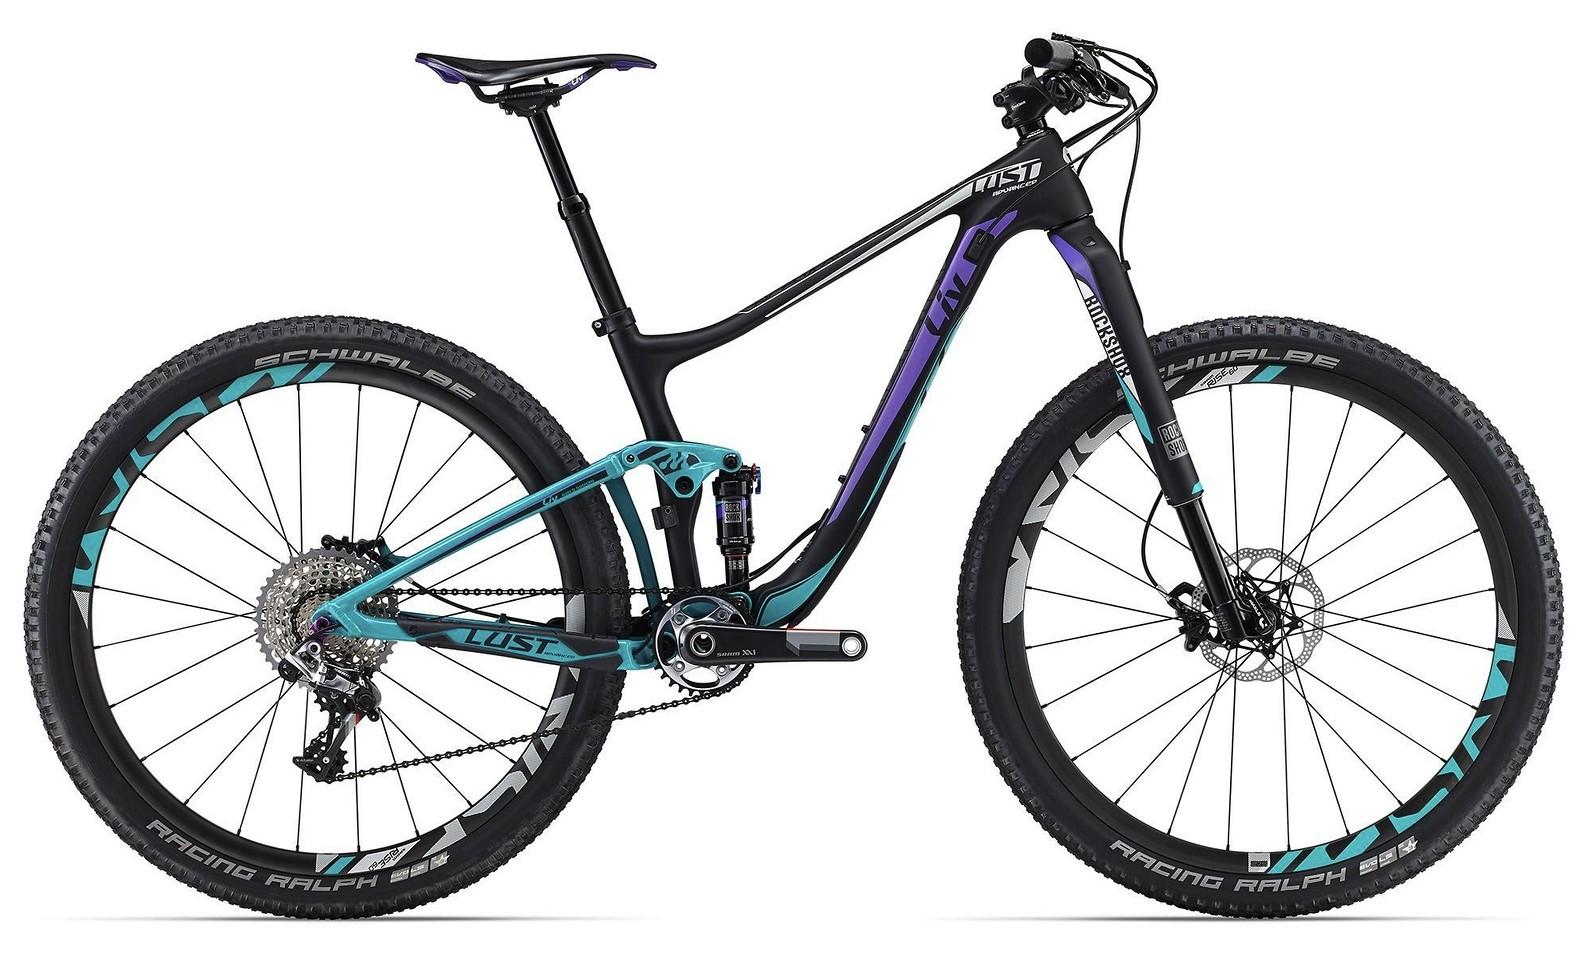 2016 Liv Lust Advanced Bike